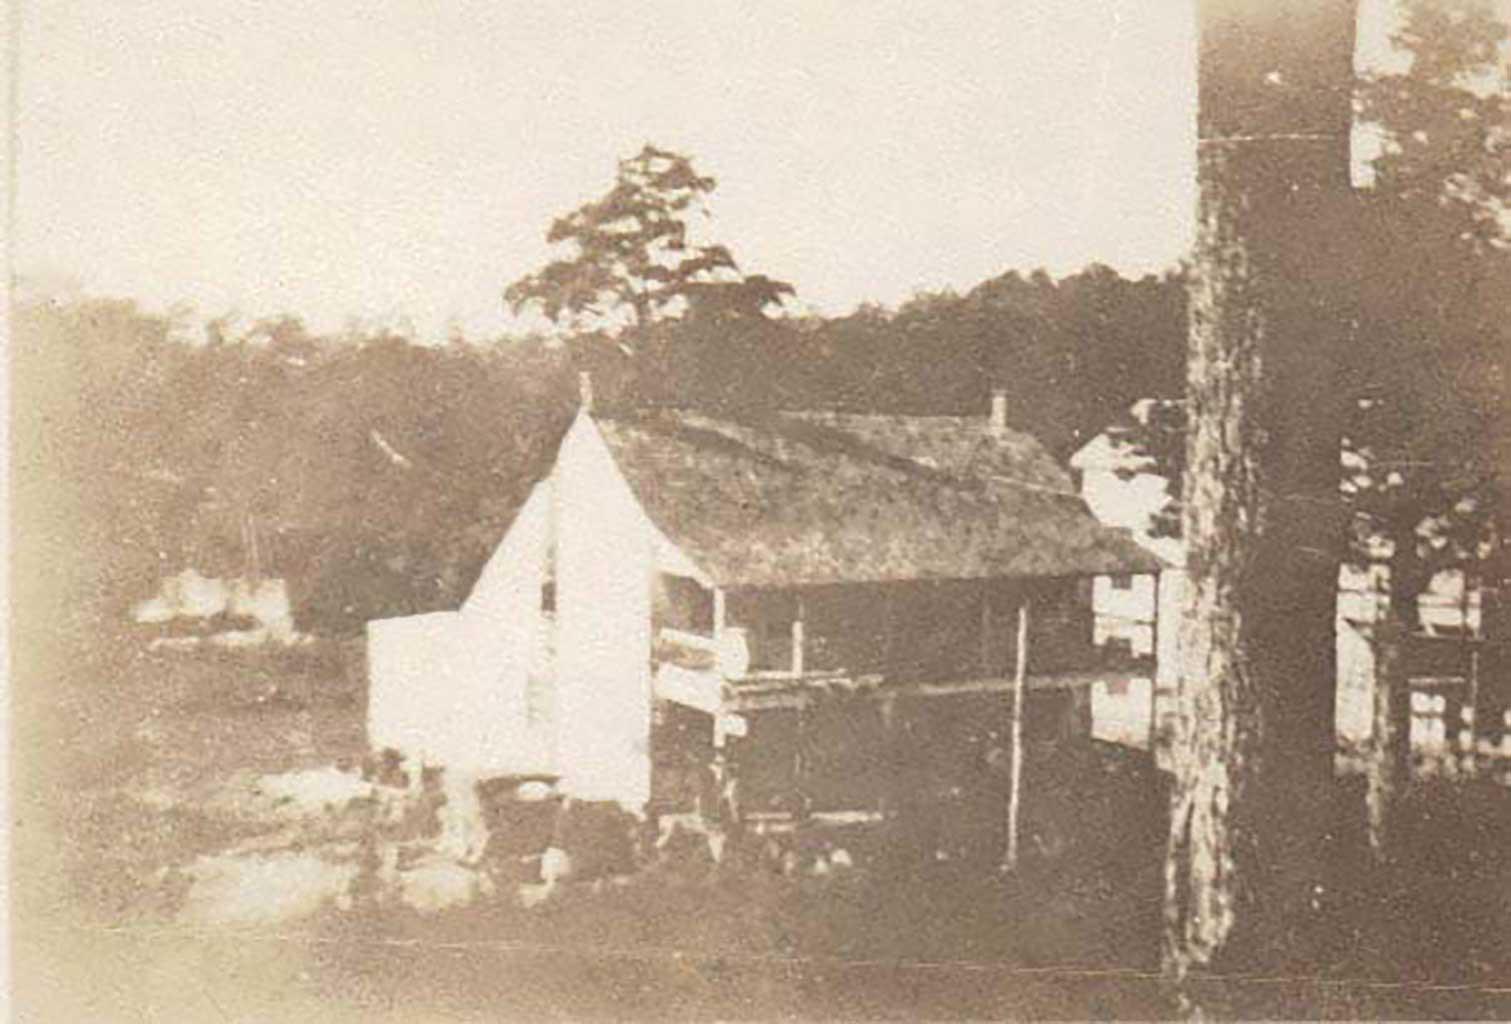 everets-c1924-kirk-turner-moore-martin-store-held-1st-post-office